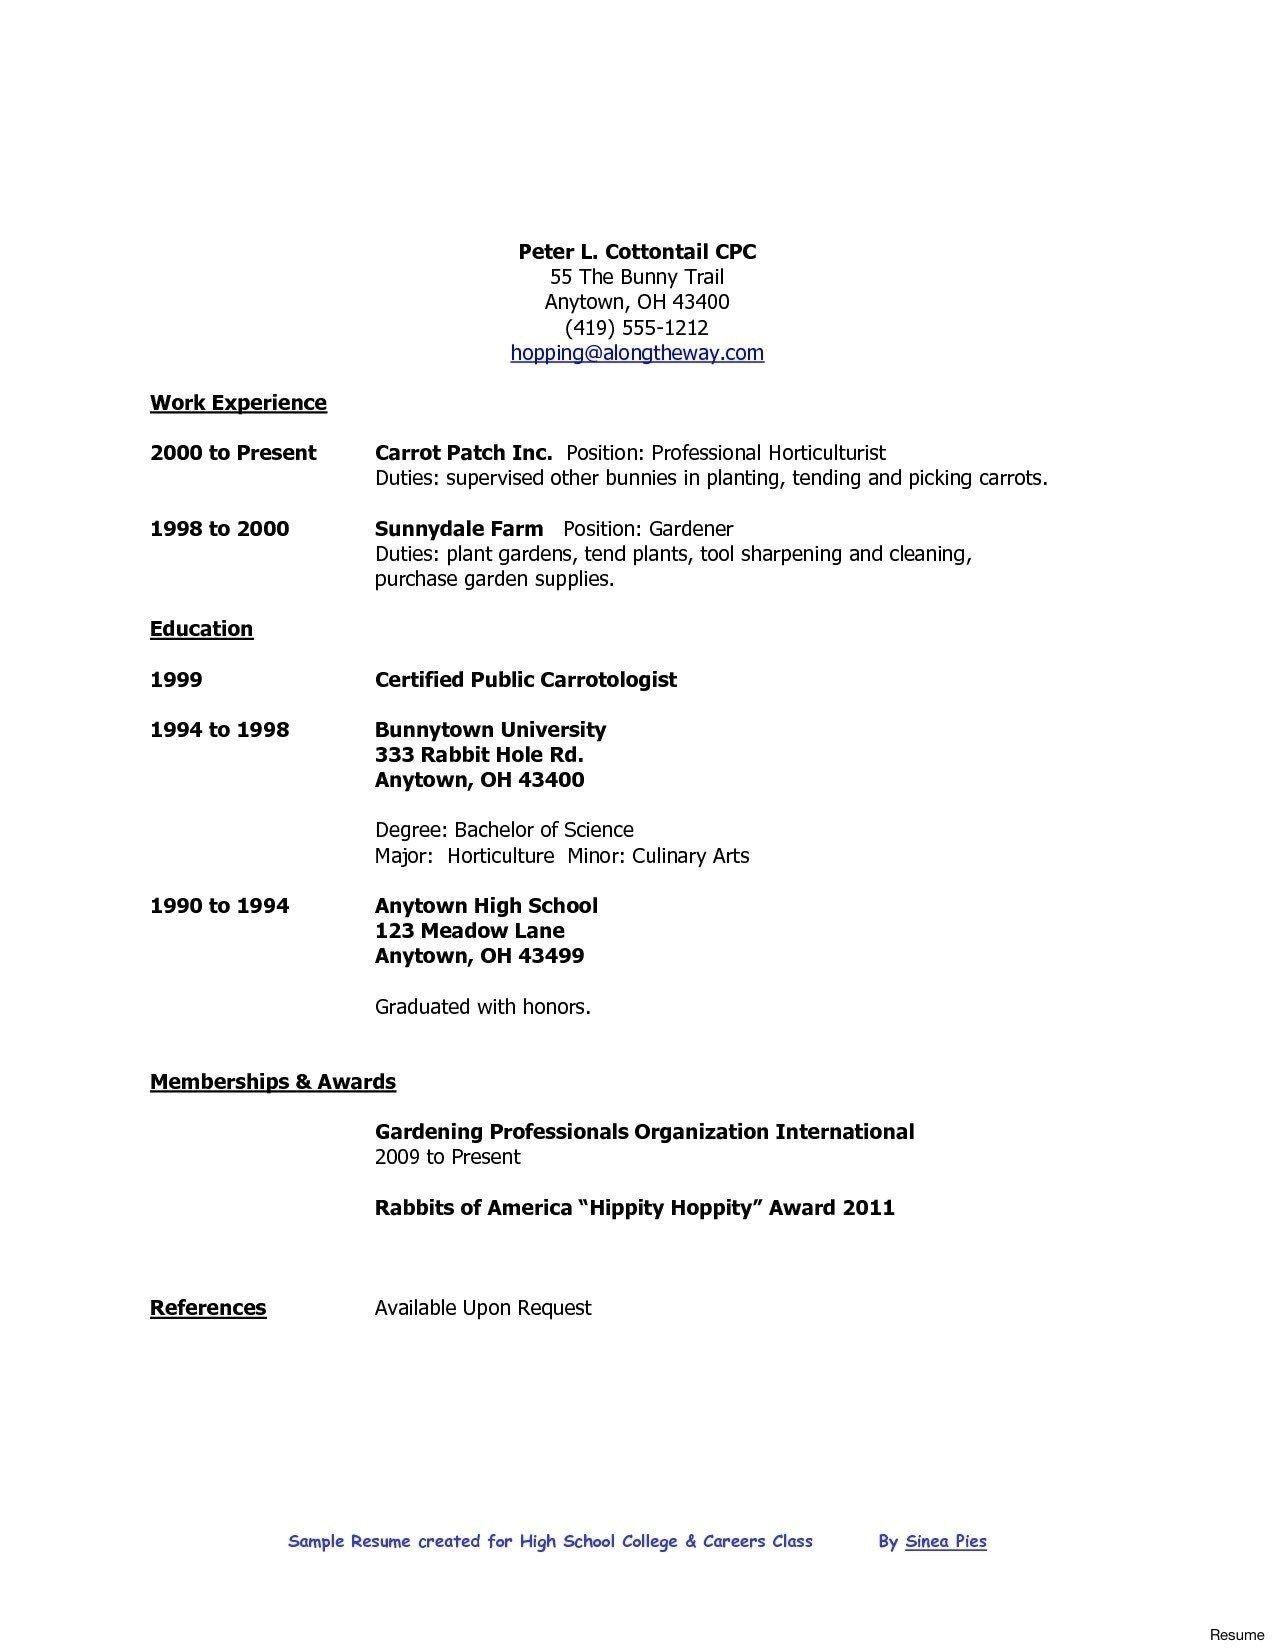 High School Graduate Resume Template Download Resume Simple